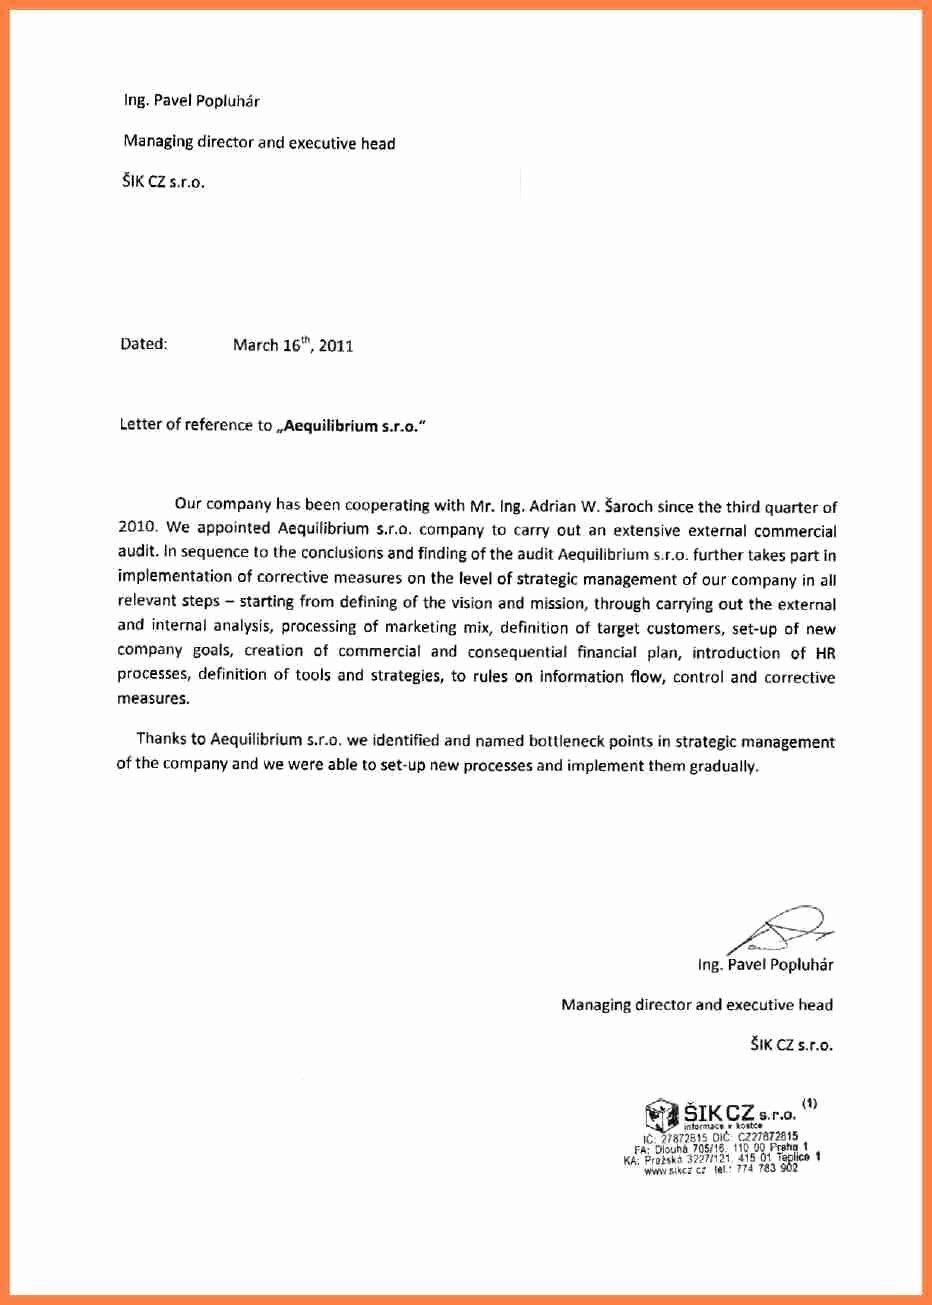 Sample Professional Letter Of Recommendation Elegant 11 Letter Of Re Mendation Pany